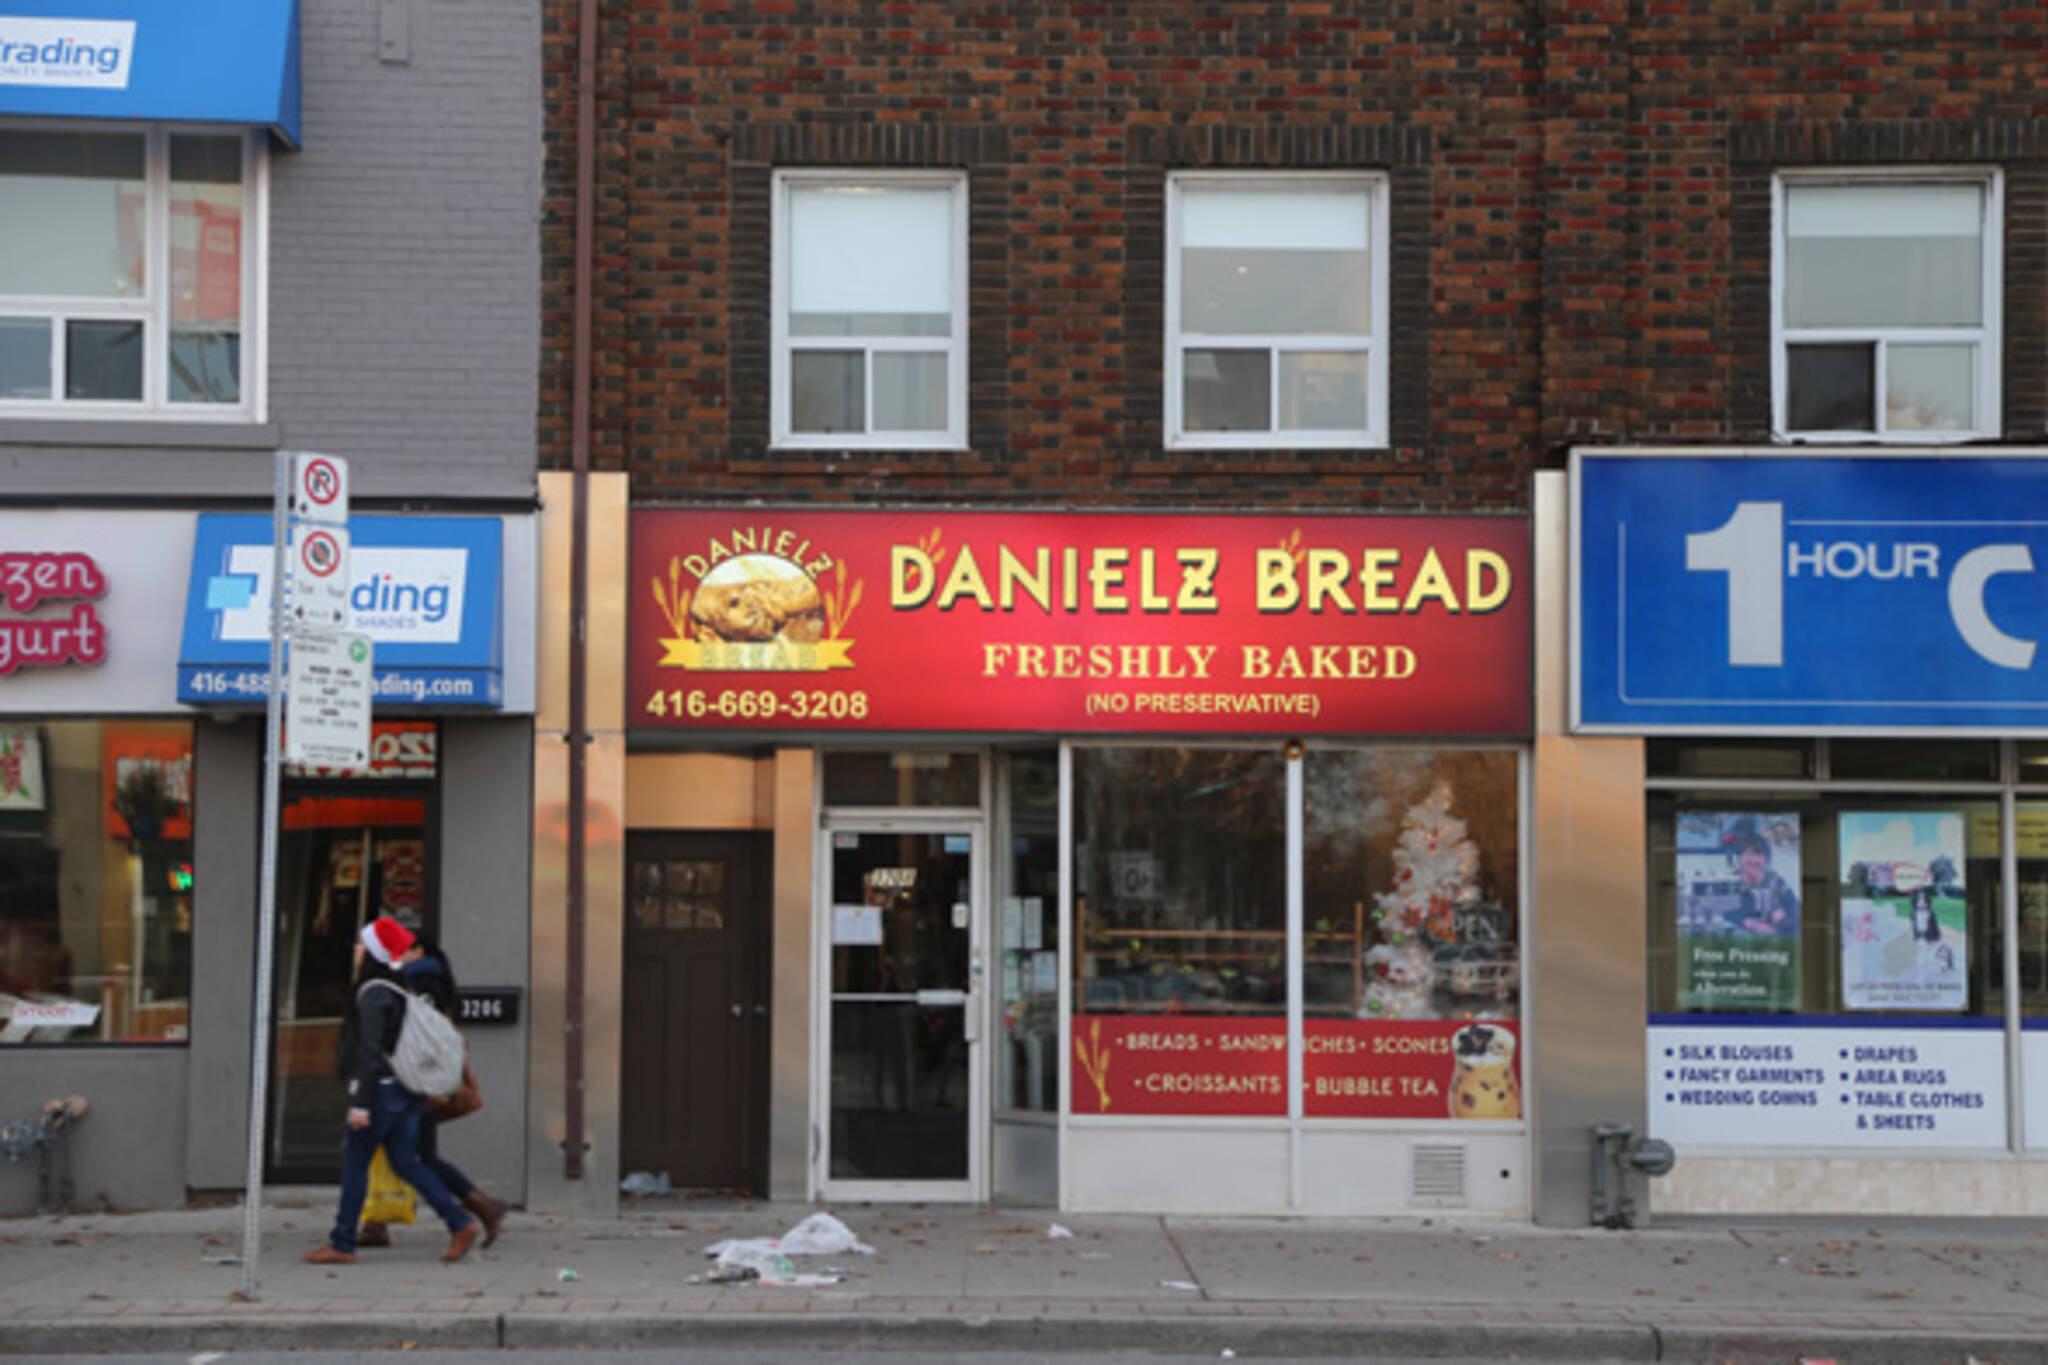 Danielz Bread